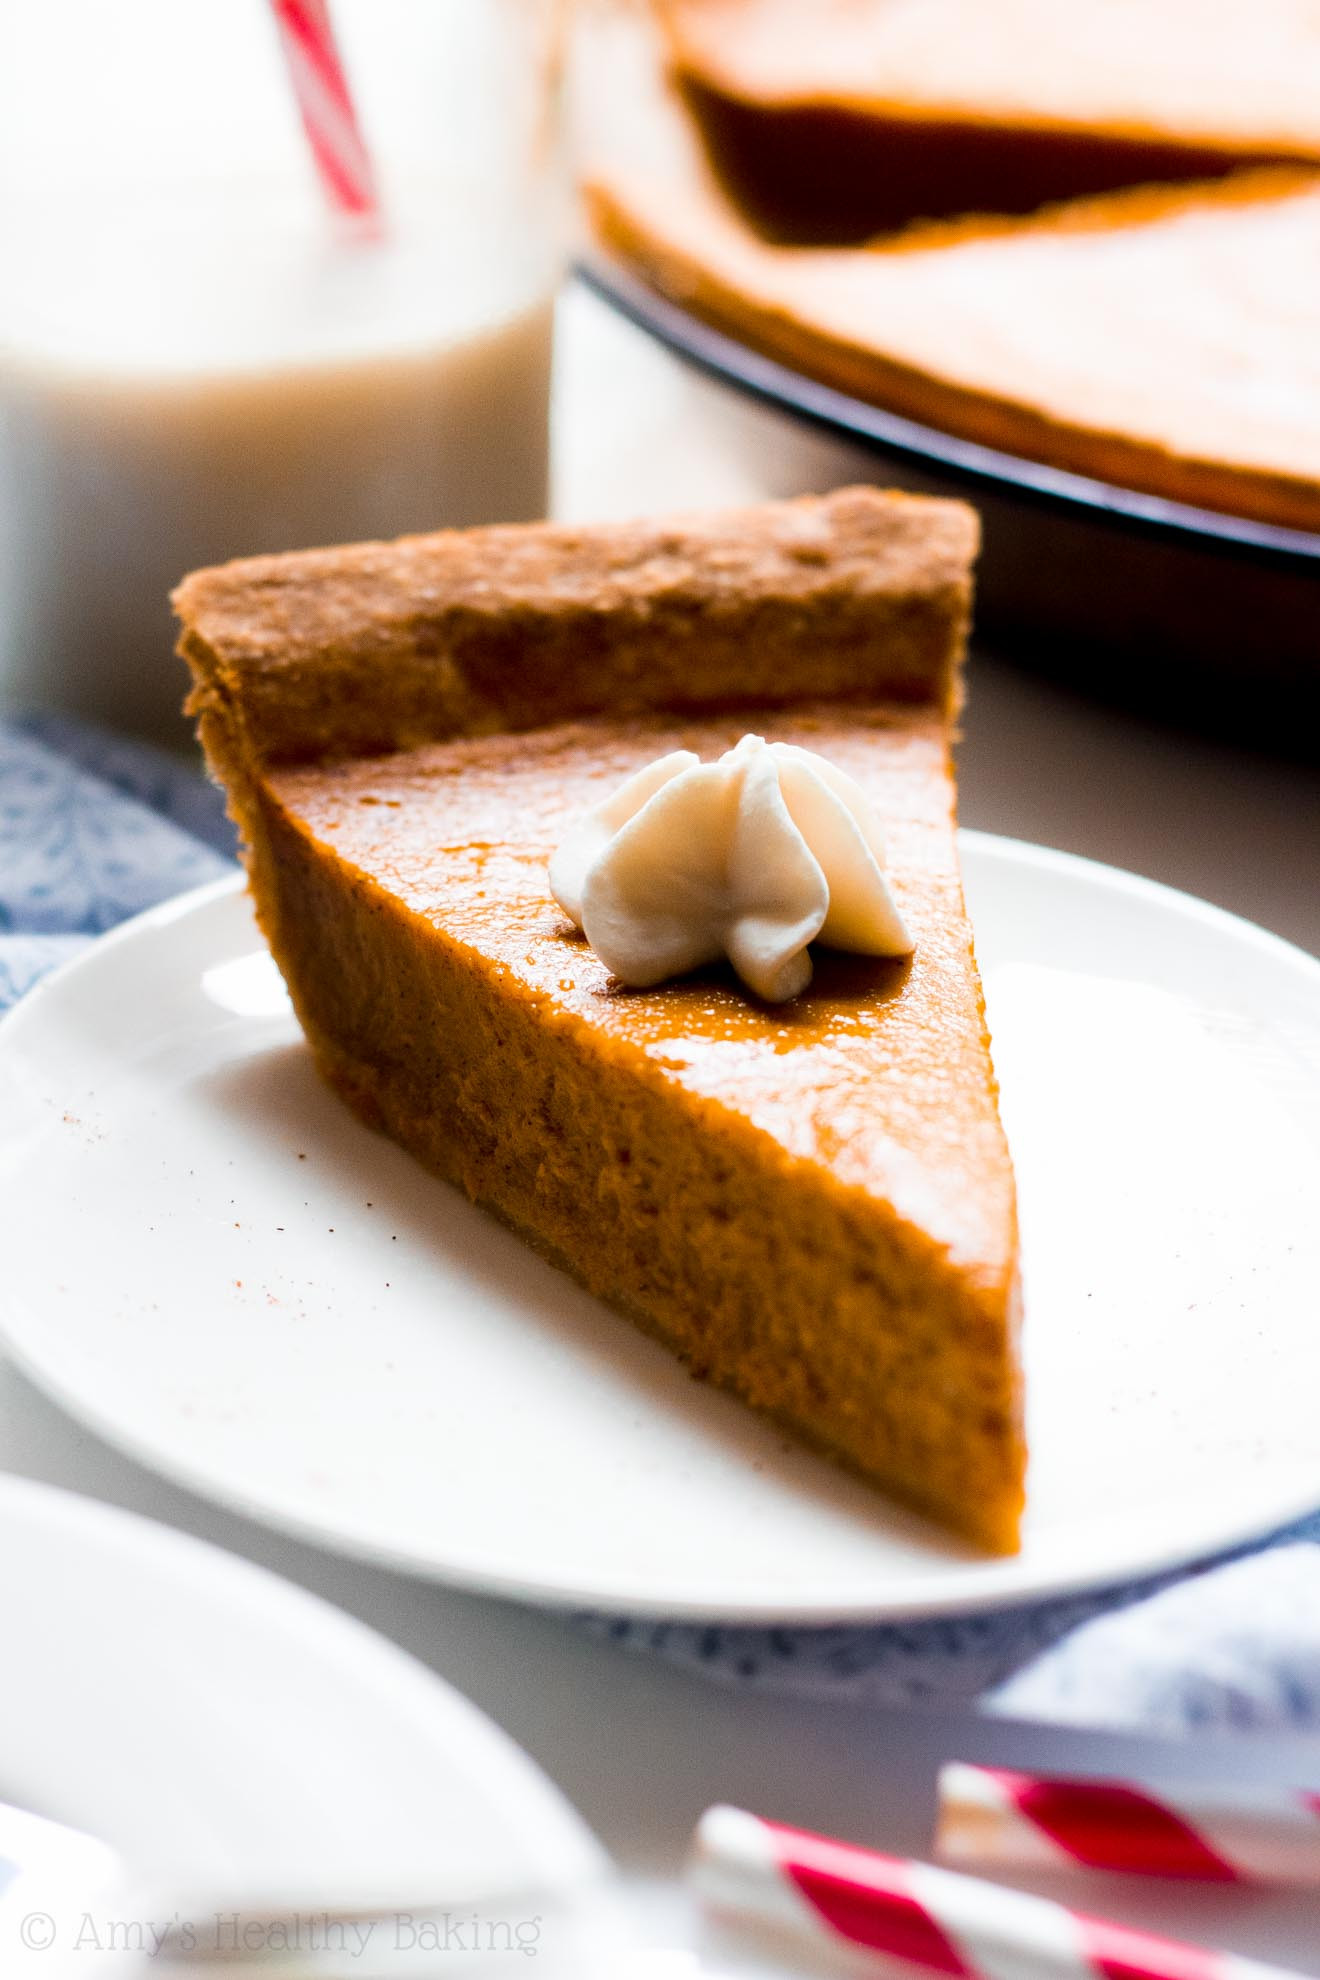 Pumpkin Dessert Recipes Healthy  The Ultimate Healthy Pumpkin Pie